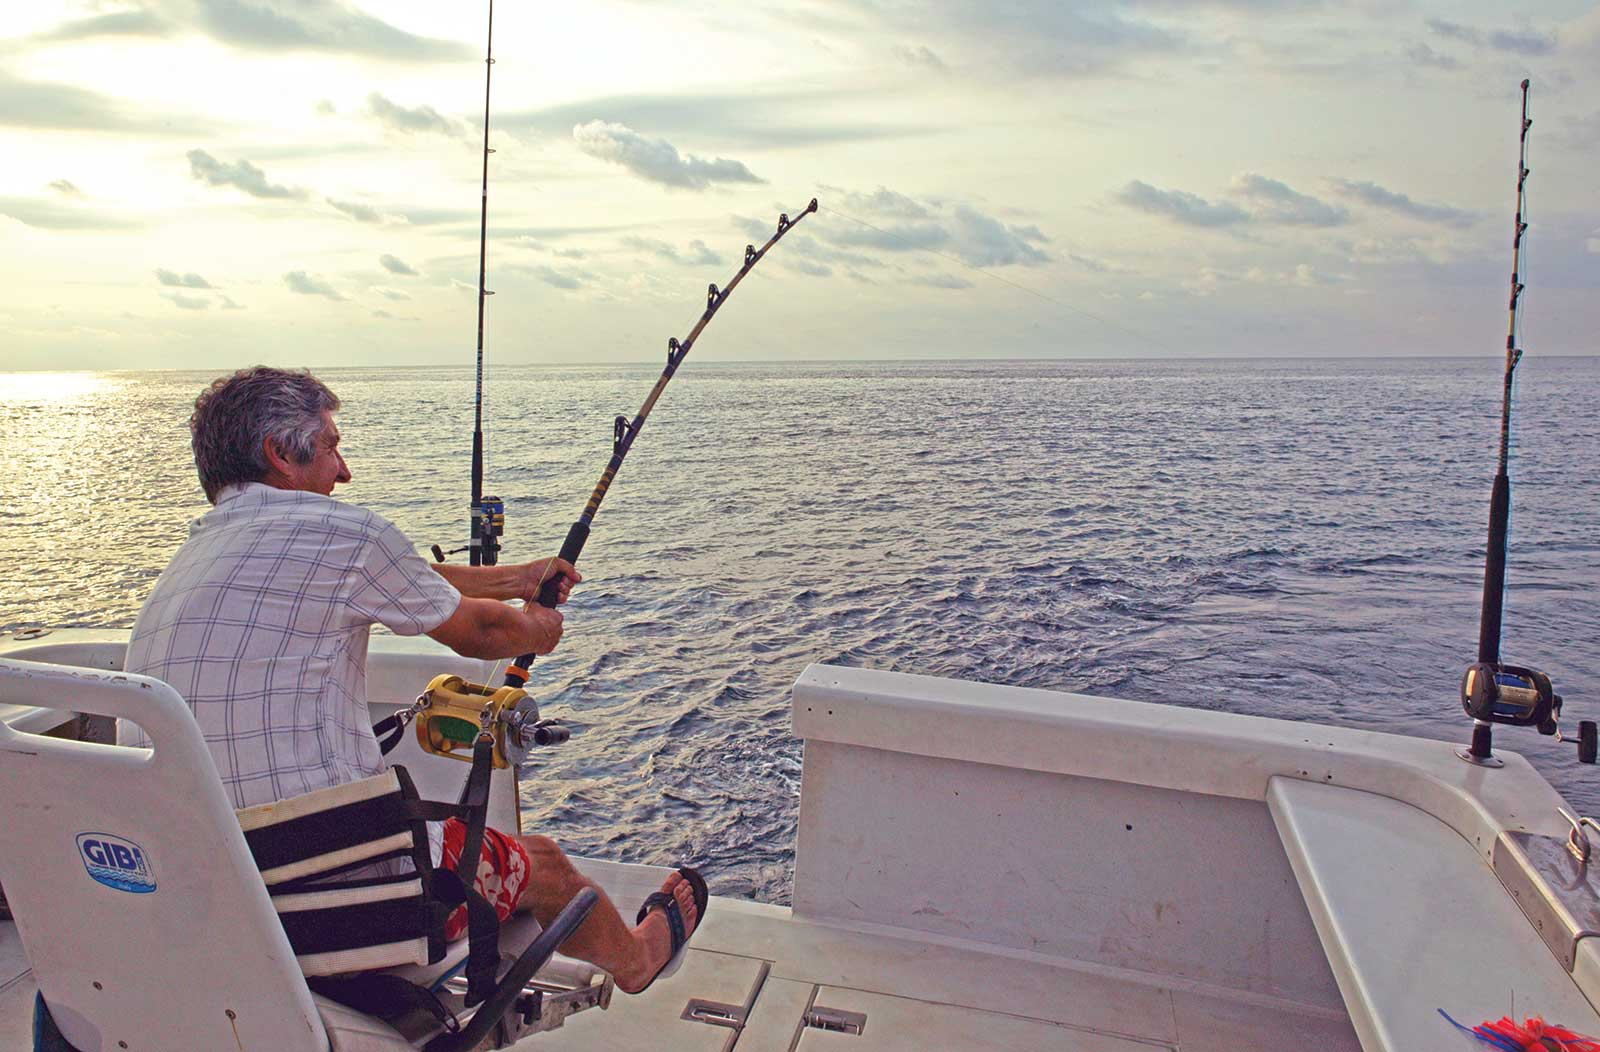 Pêche sportive en bateau dans les eaux de Principe, espadon bleu, pèlerin, barracuda, wahoo et daurades